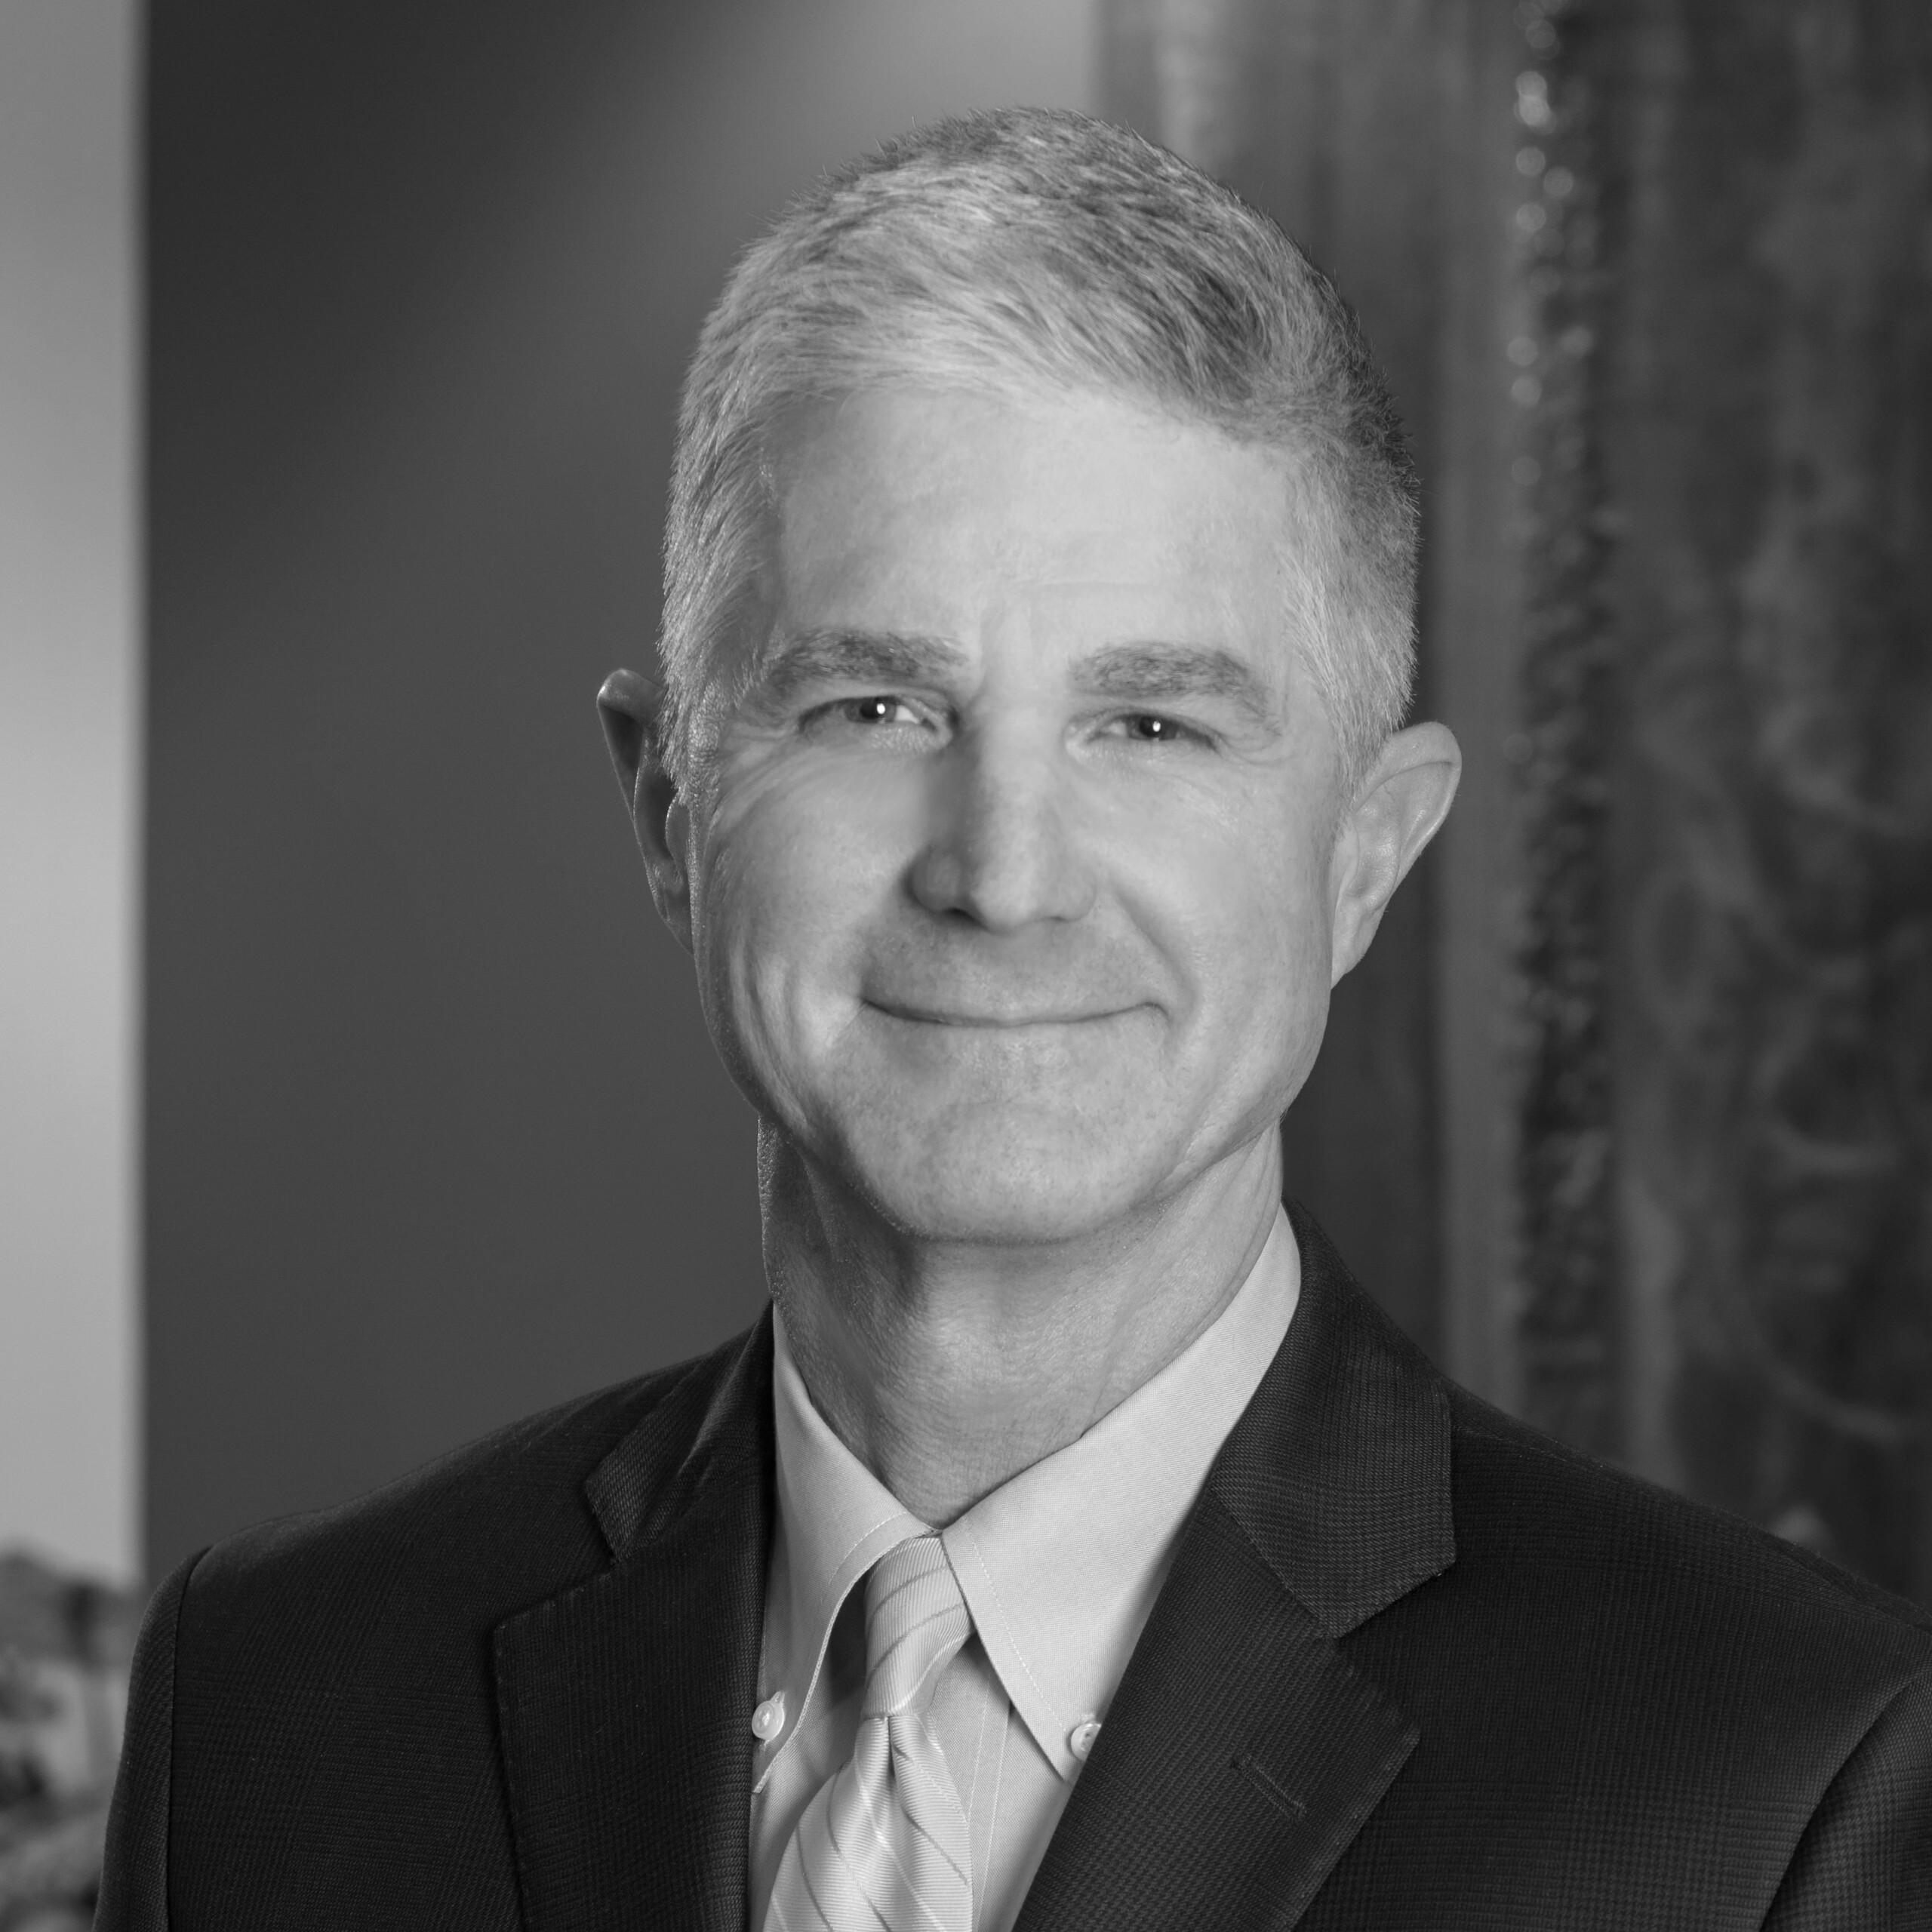 Dr. Mark Delworth